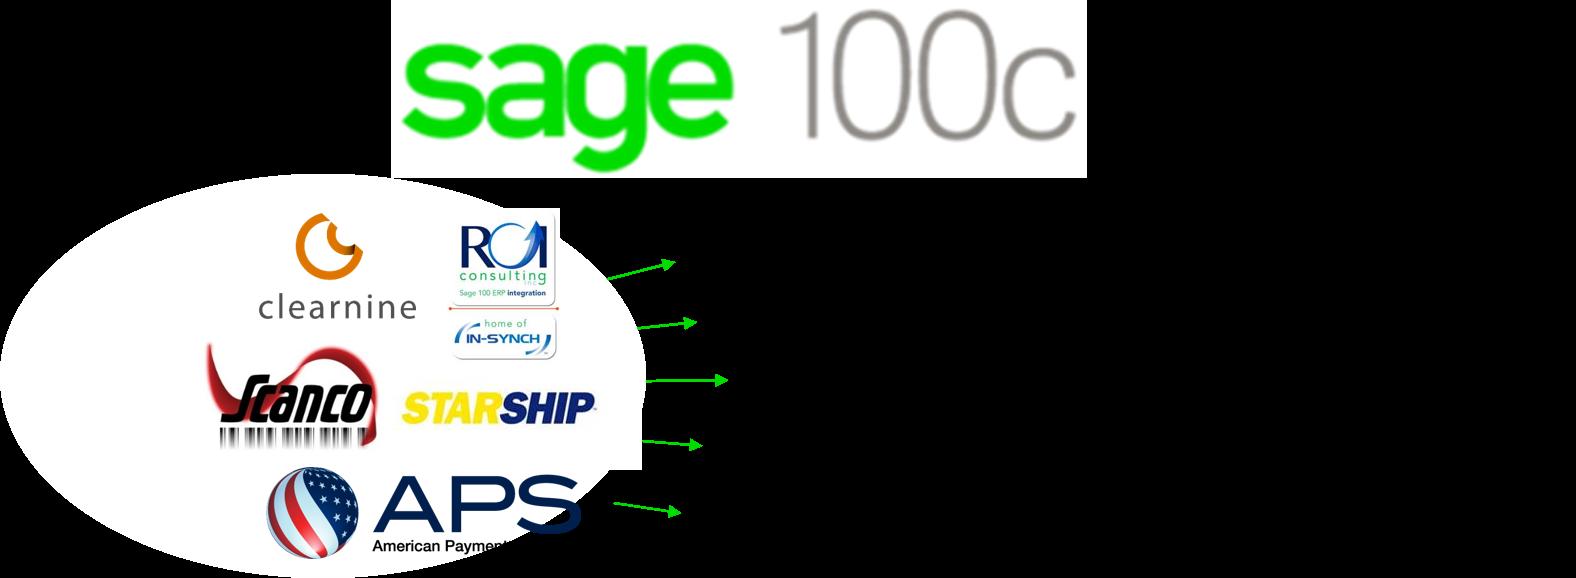 Sage 100c eCommerce 2